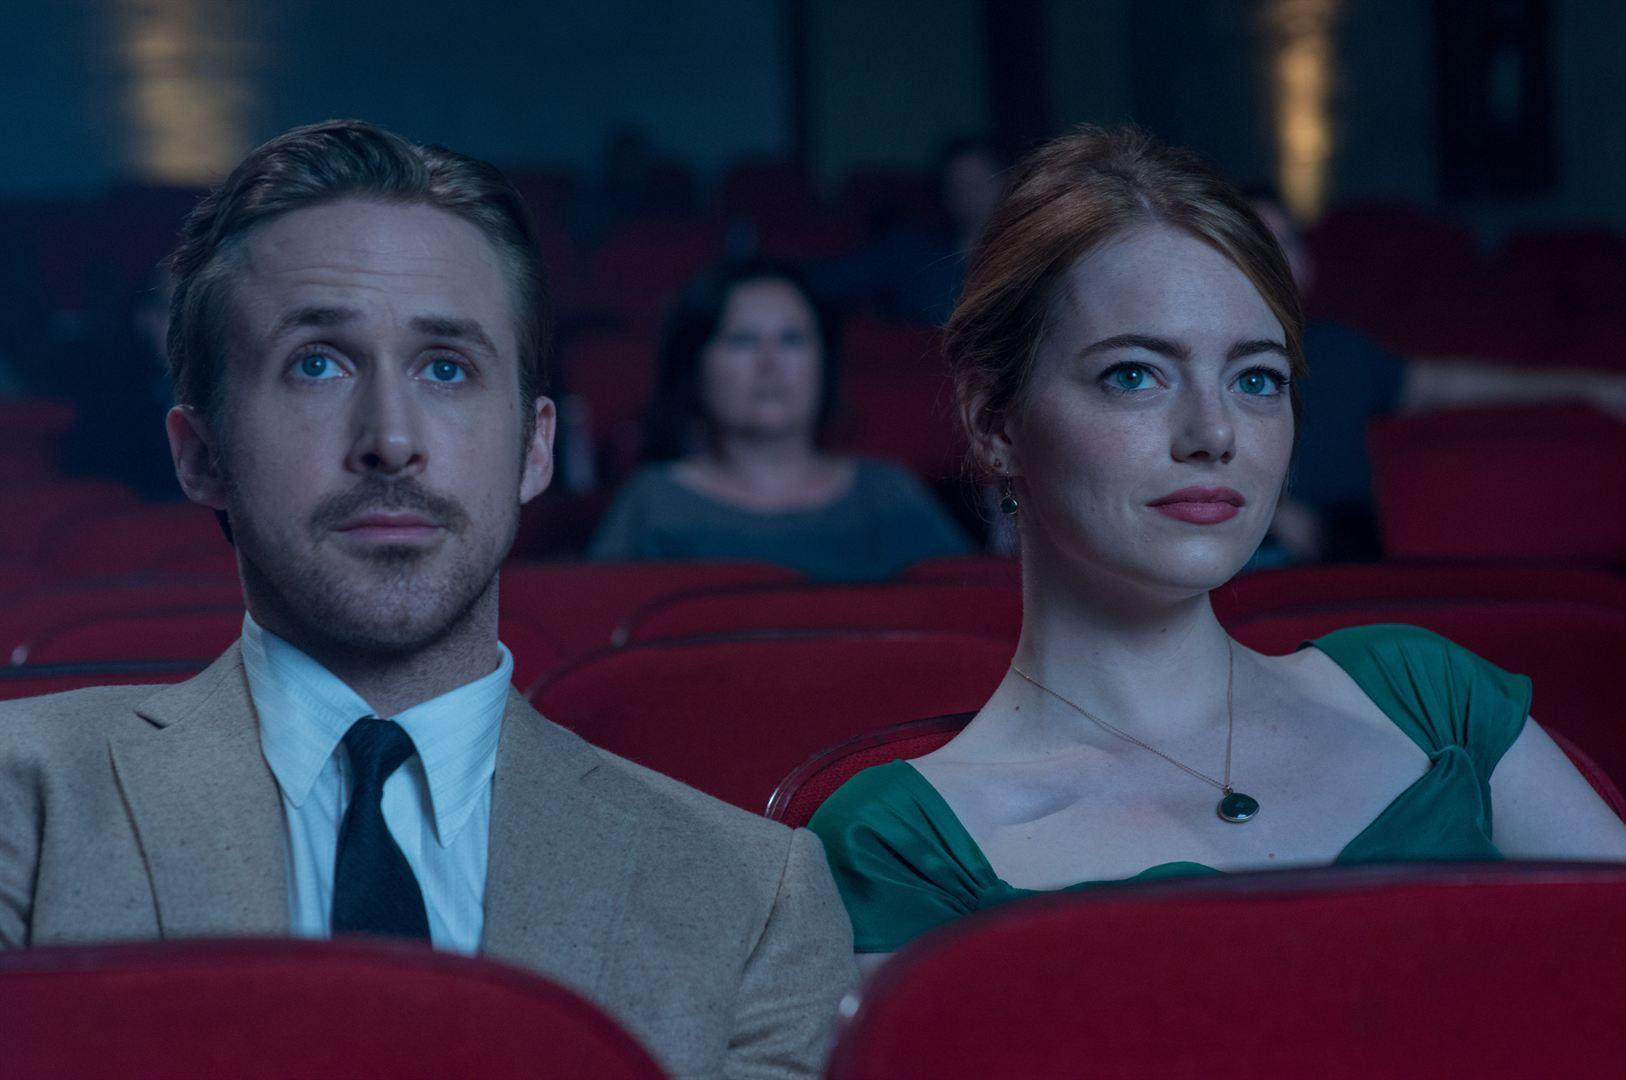 La La Land Los Angeles - Teatro Rialto Cinema